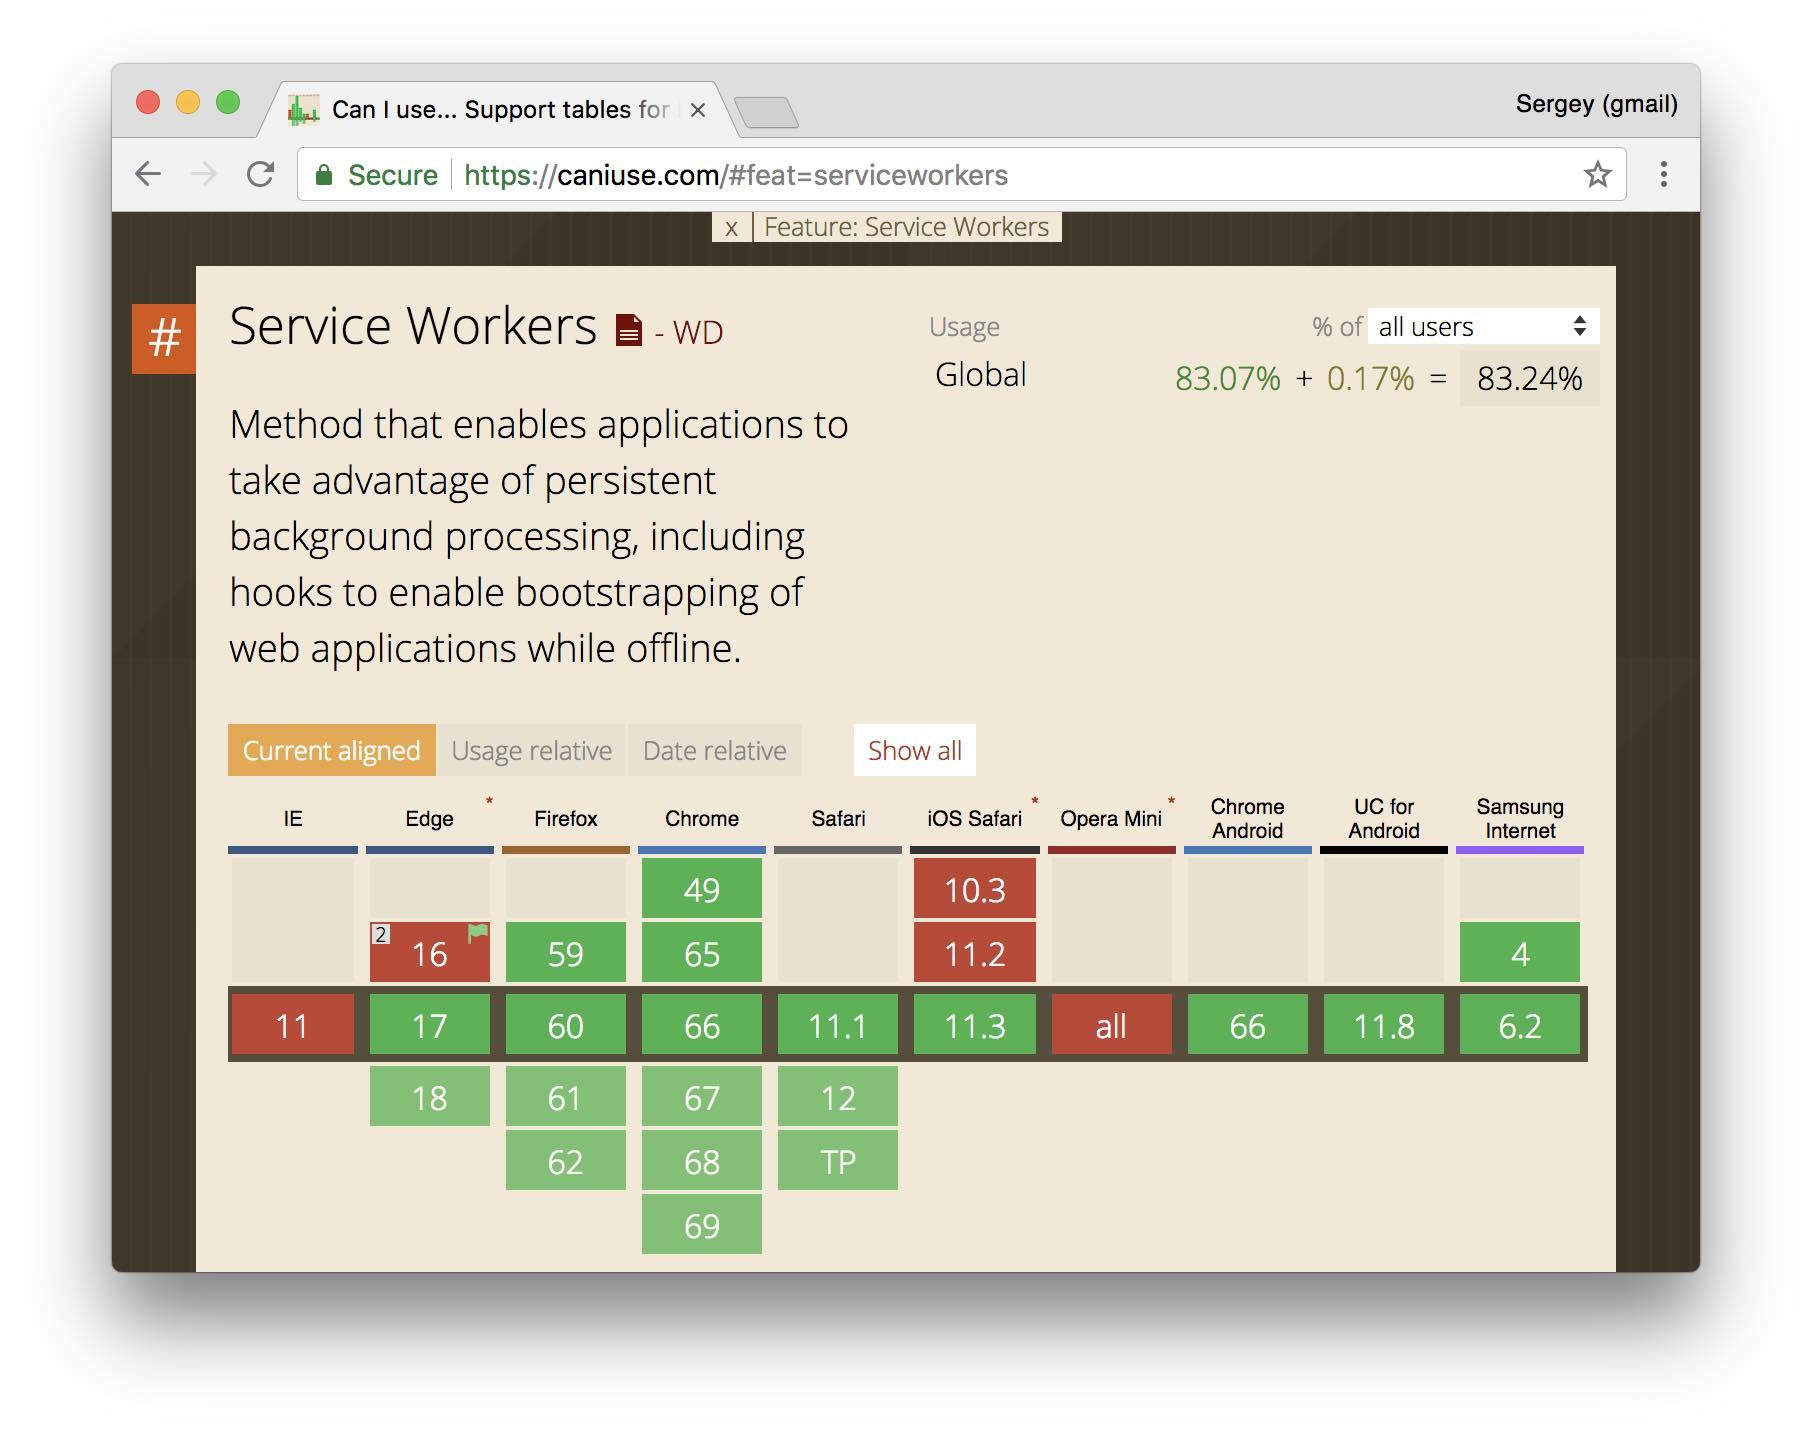 Can PWA (Progressive Web Apps) sample of 2018 make up a